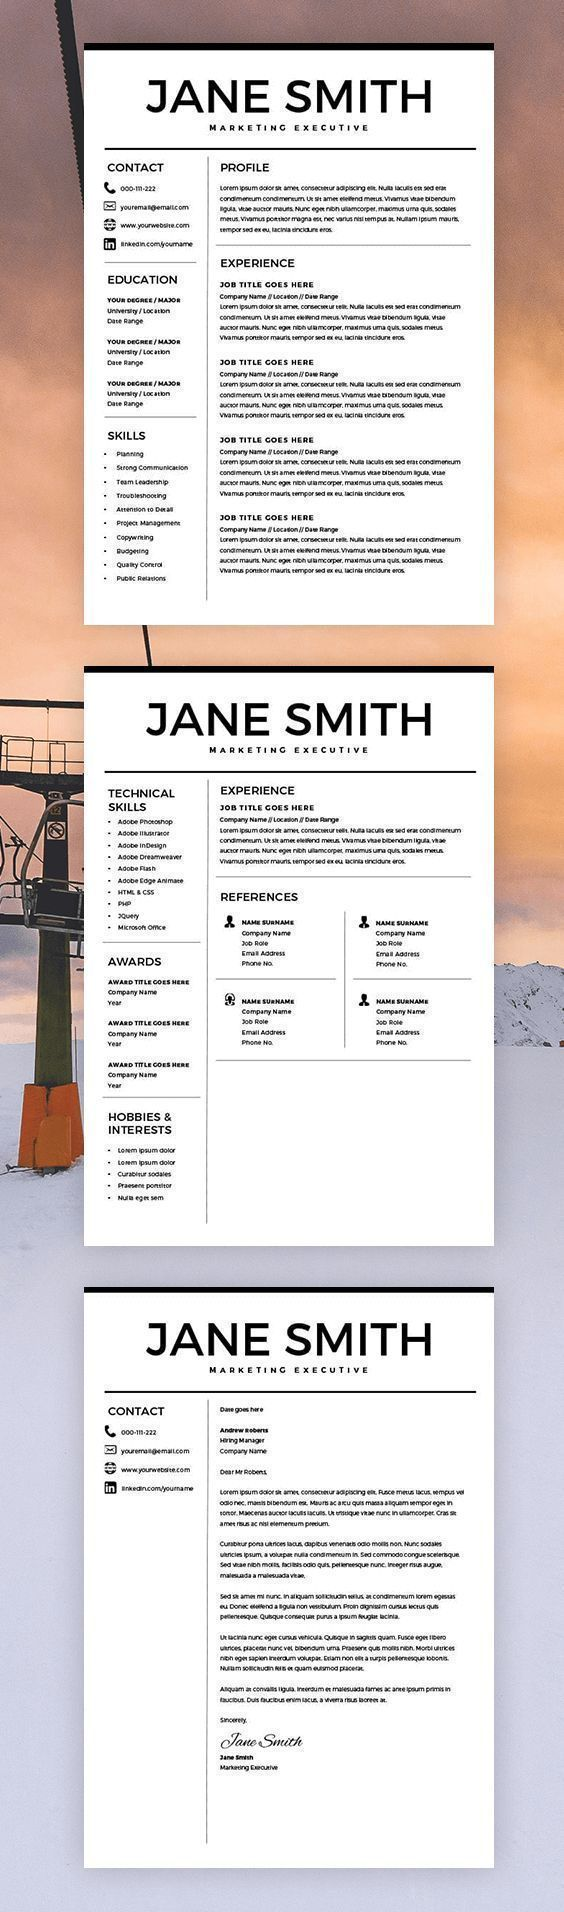 Resume for Microsoft Word Minimal Resume Template CV